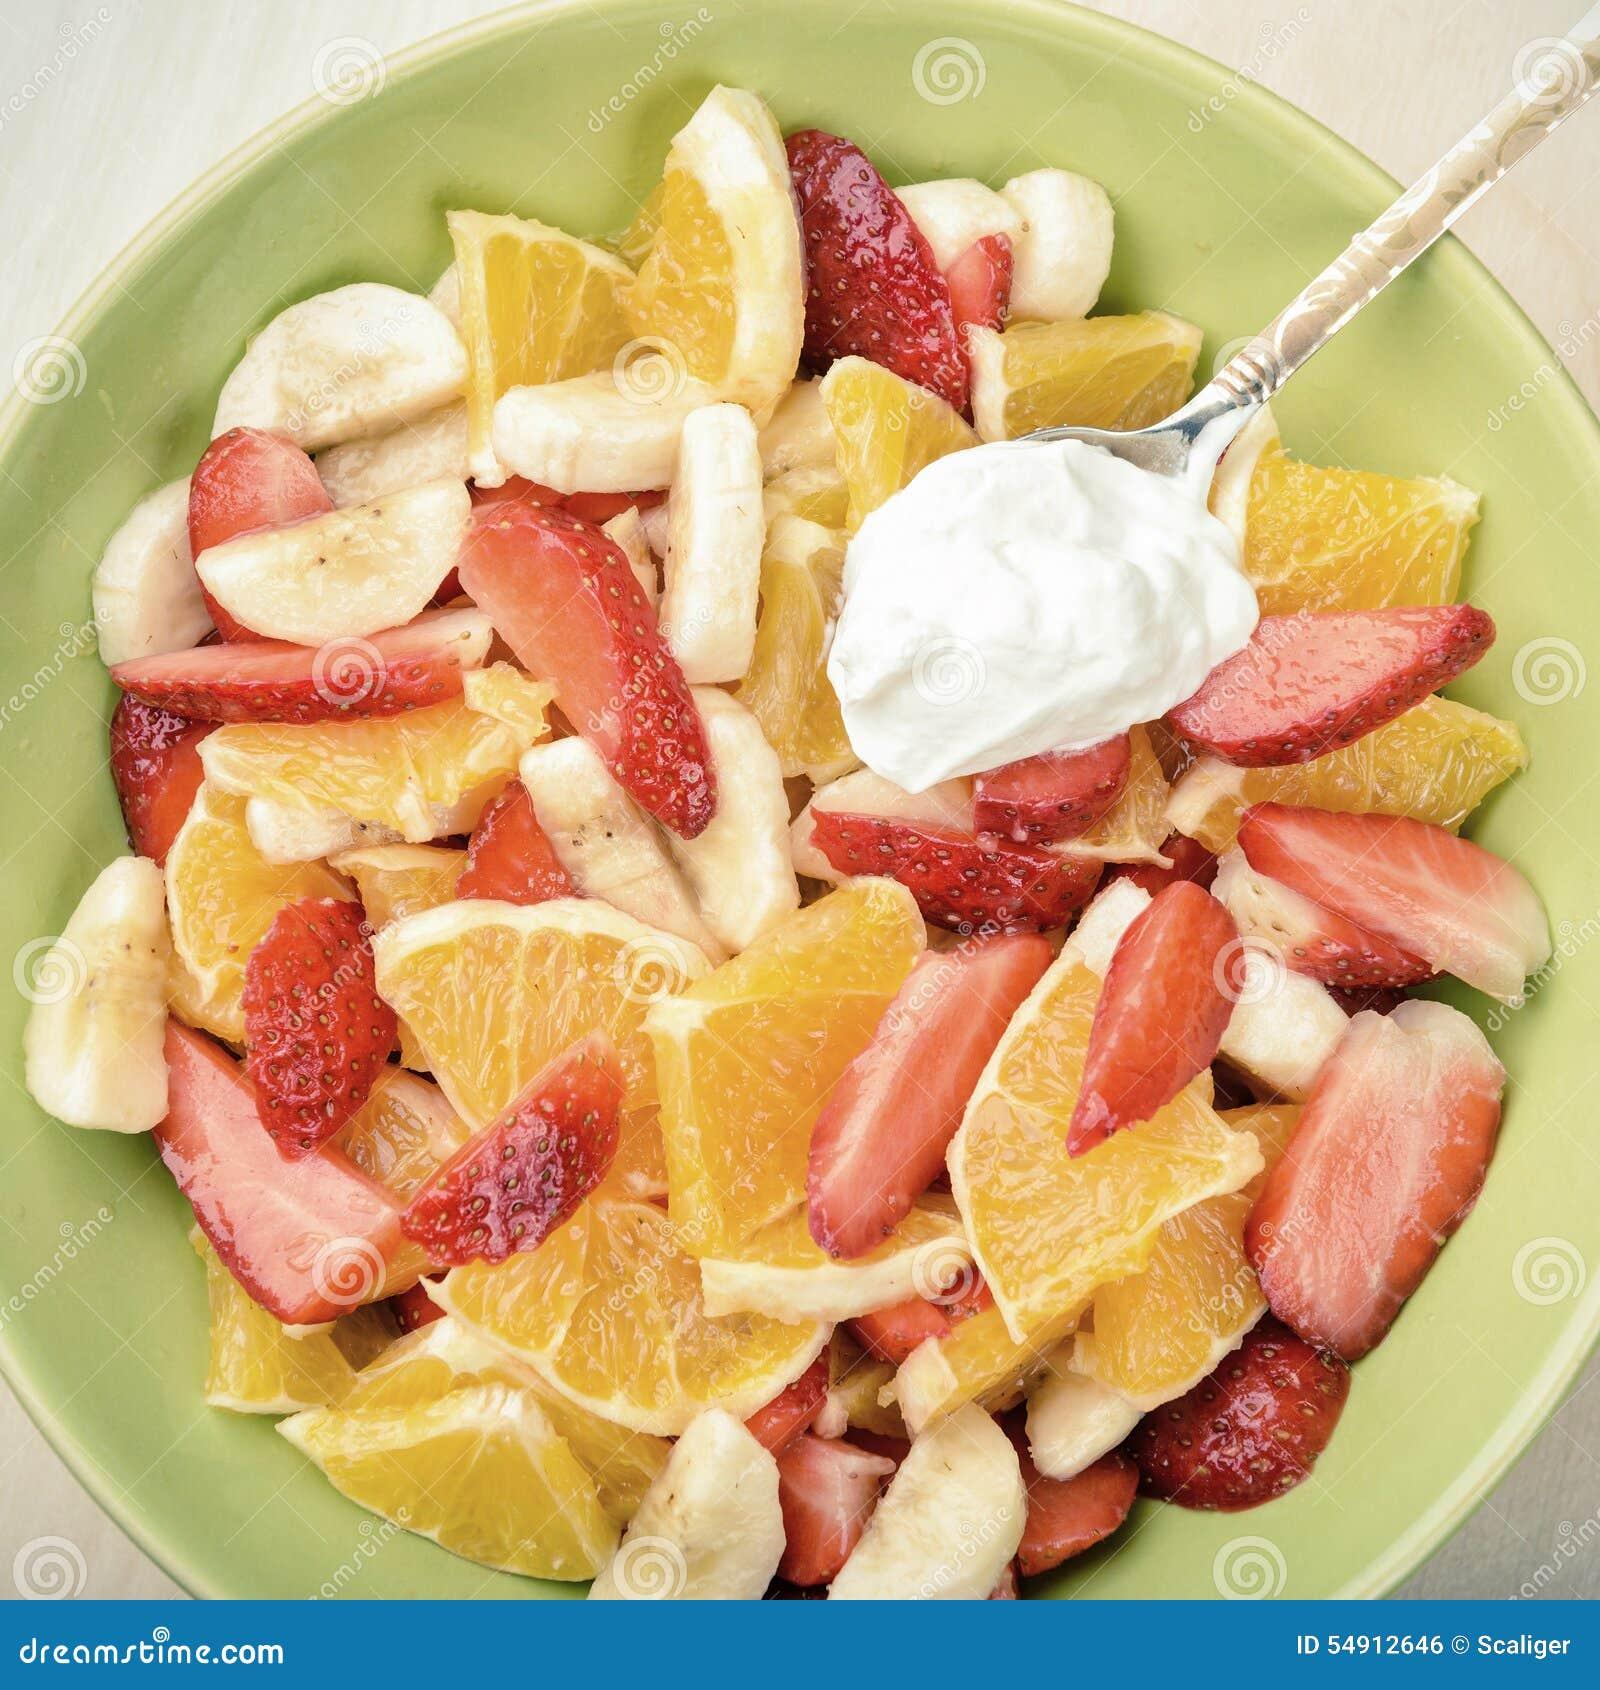 Download Fruit Salad With Sour Cream Stock Photo - Image of retro, organic: 54912646